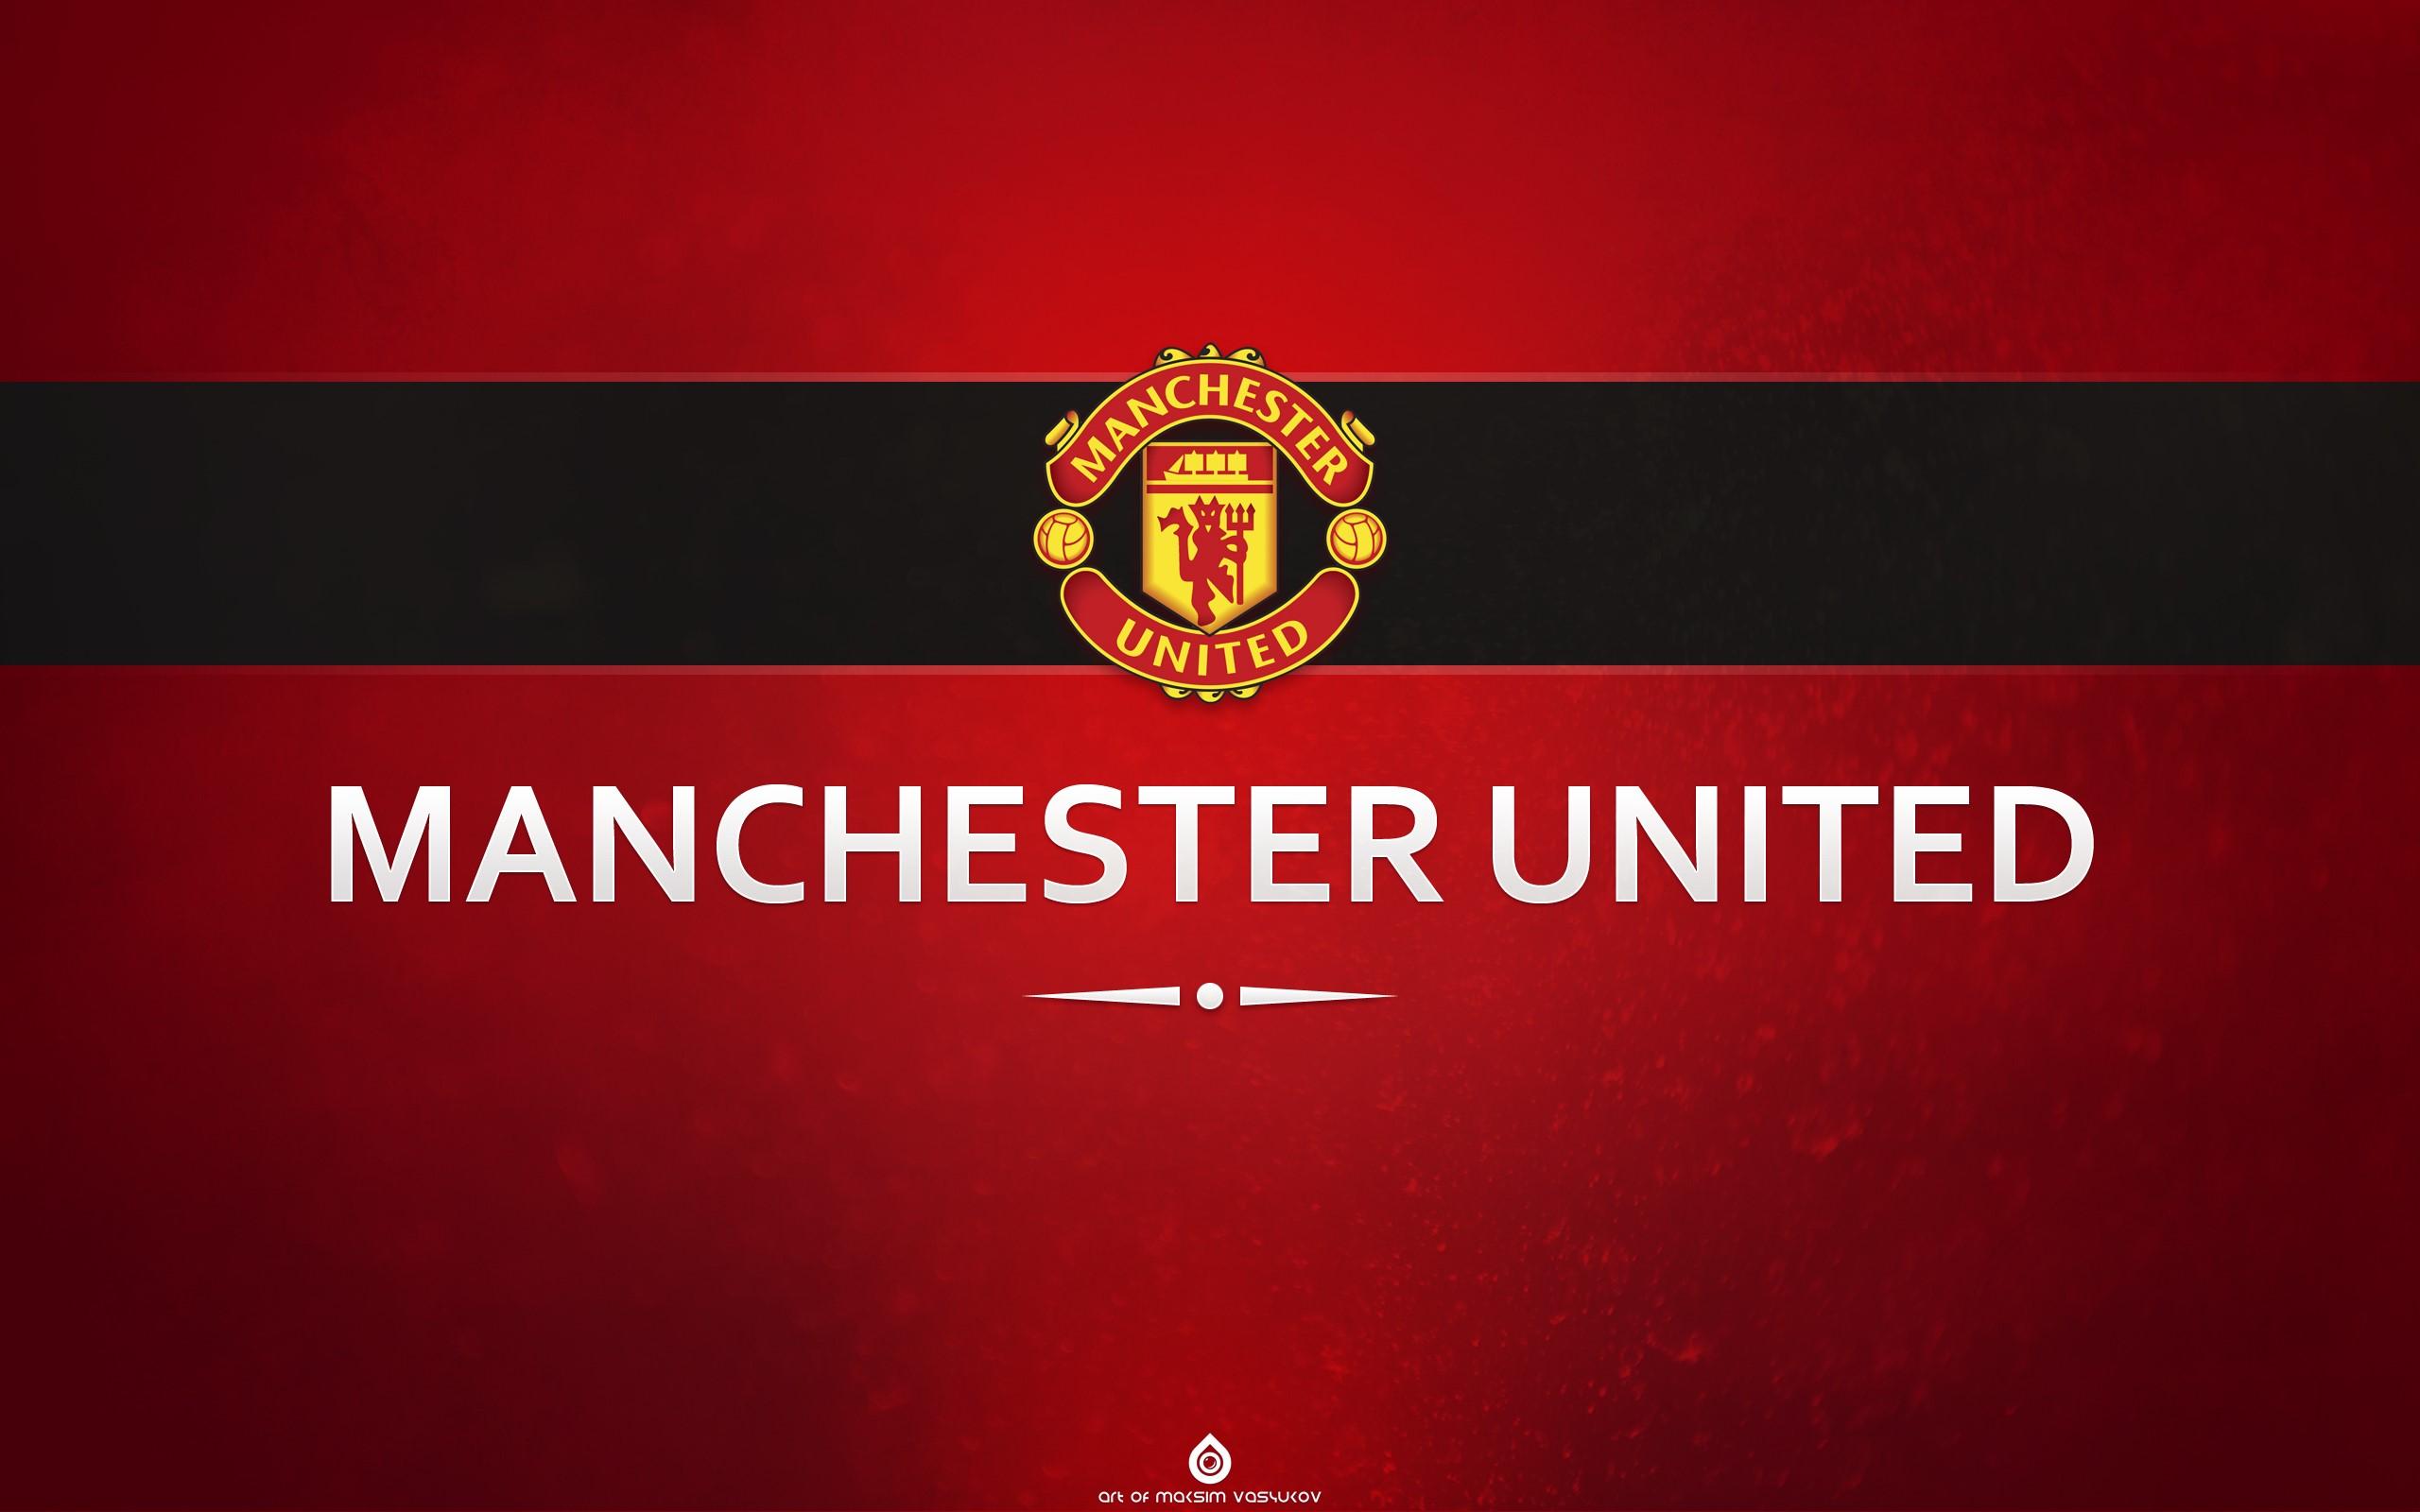 Manchester United Photos